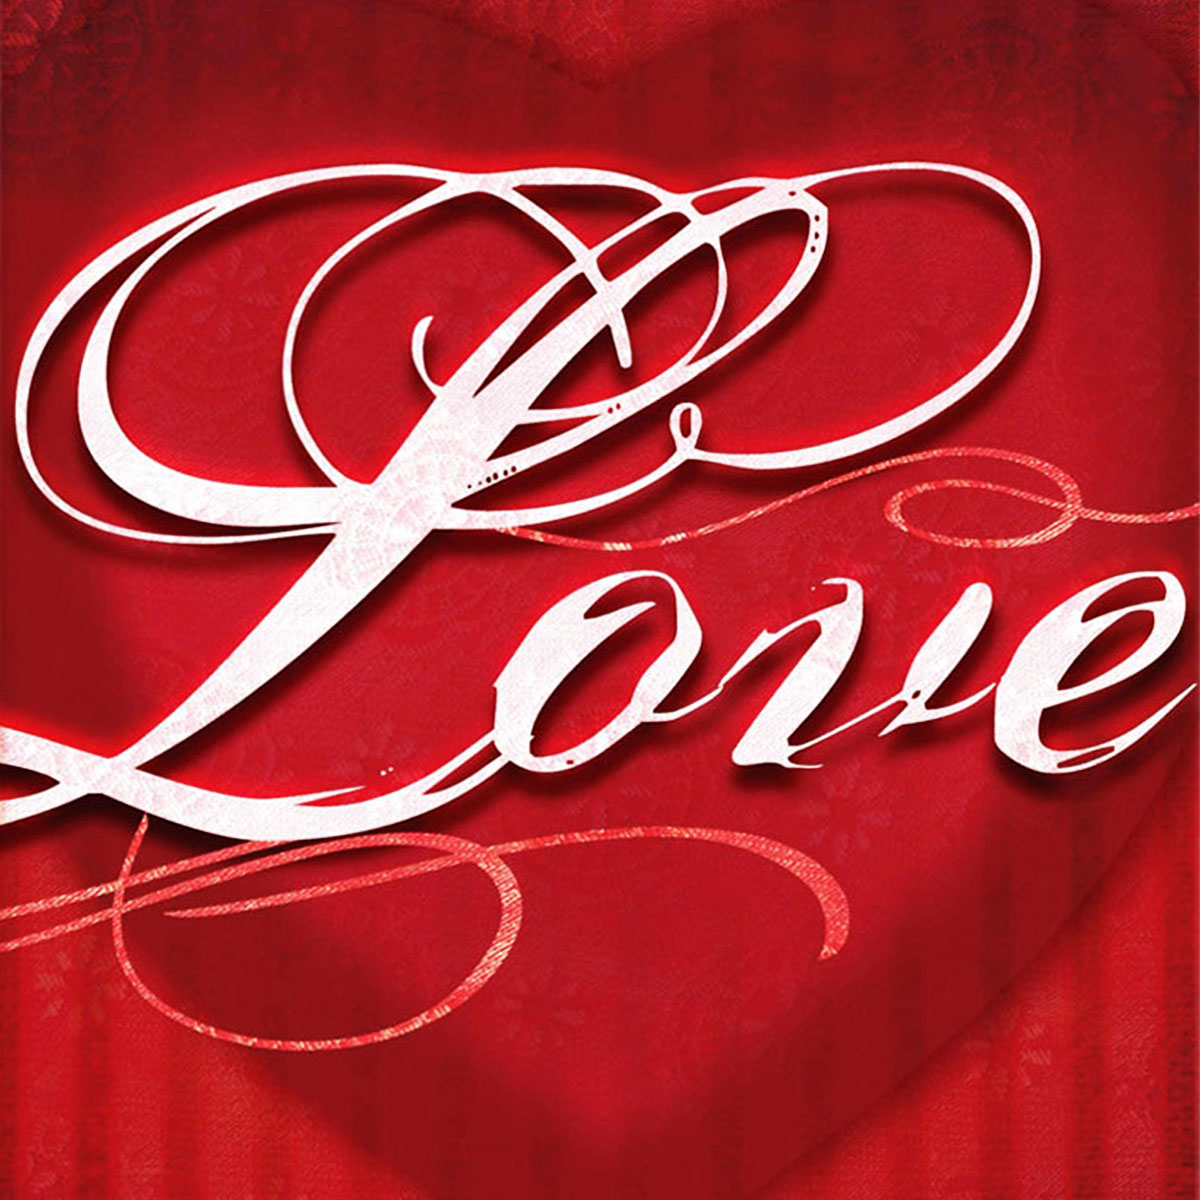 http://4.bp.blogspot.com/-zadAZEAI2Ls/T9KwIuSYK2I/AAAAAAAAI2g/zEkv0L5e8io/s1600/Love.jpg